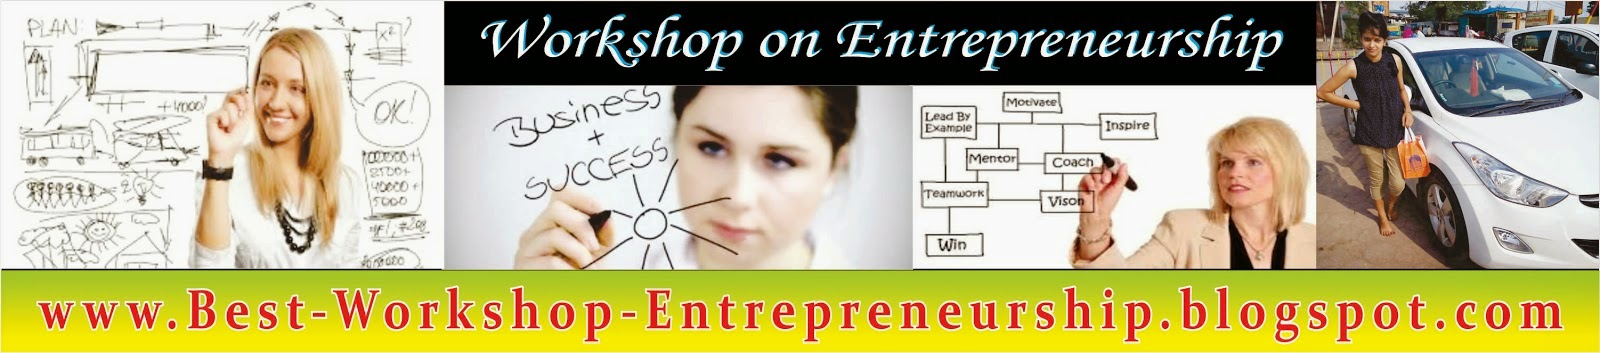 All Asia Seminar On Aviation Blogging and Entrepreneurship